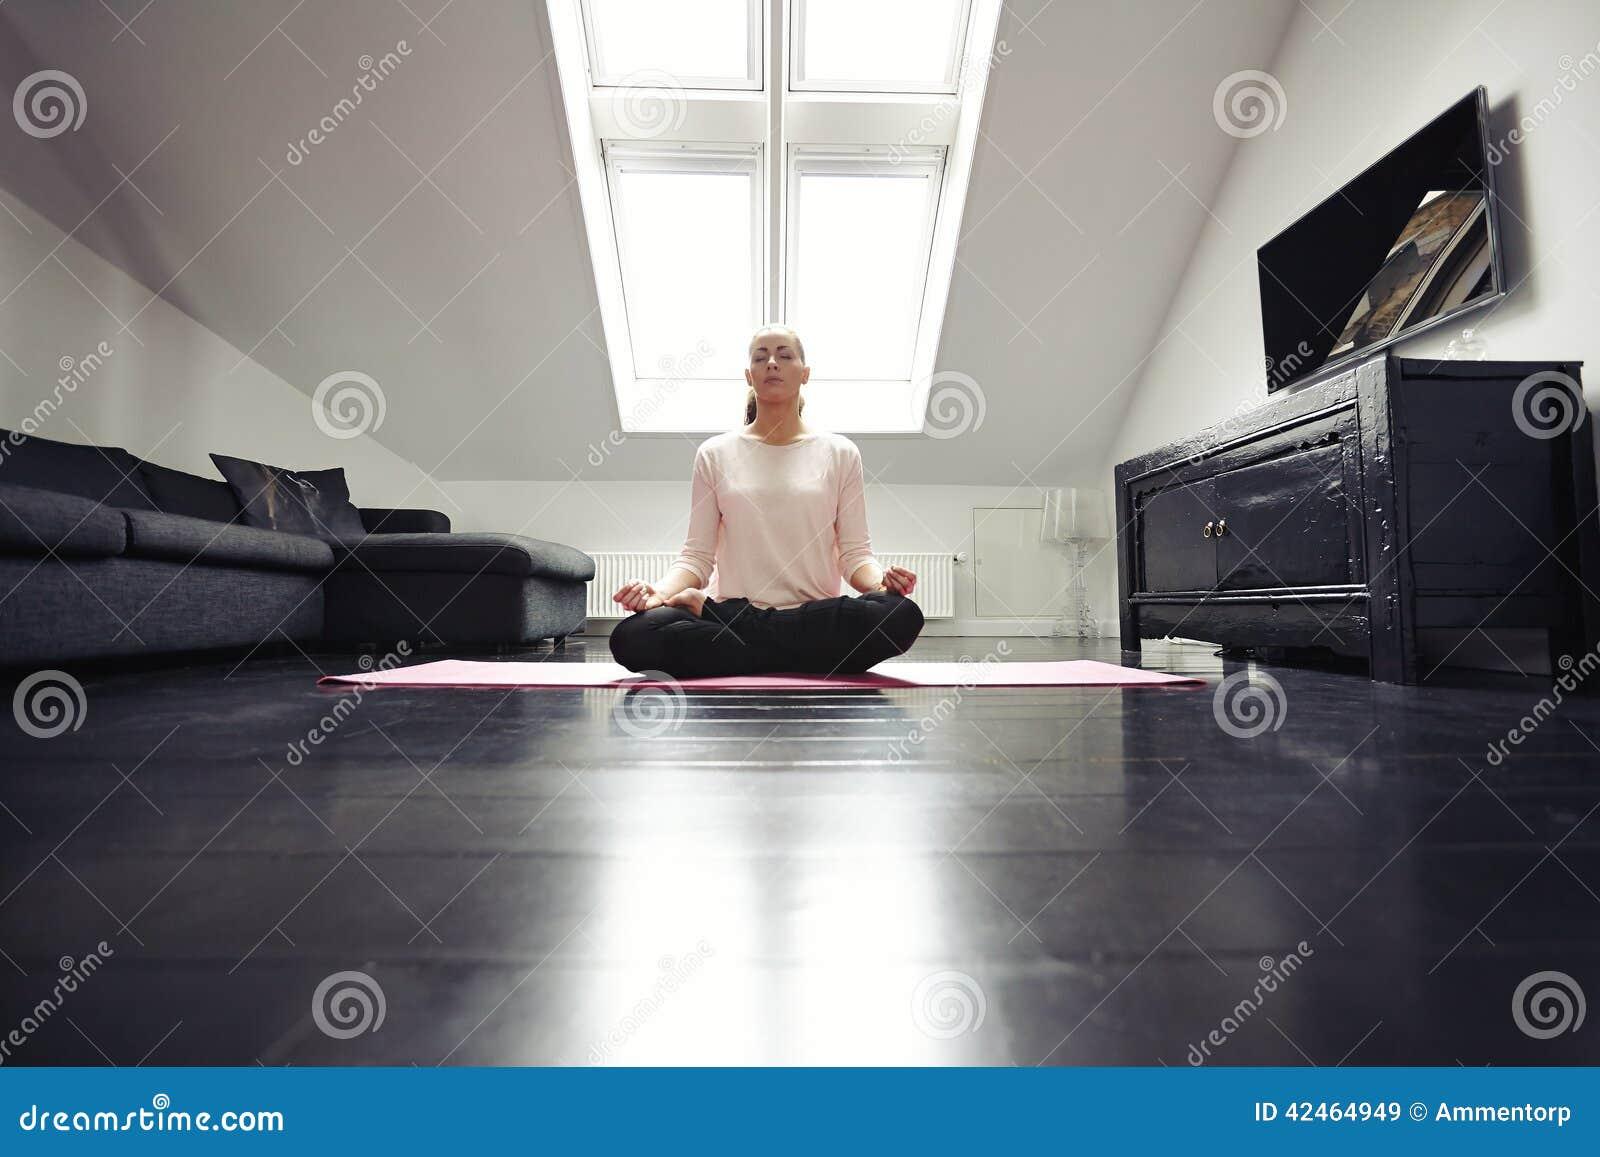 Gesunde junge Frau, die zu Hause meditiert